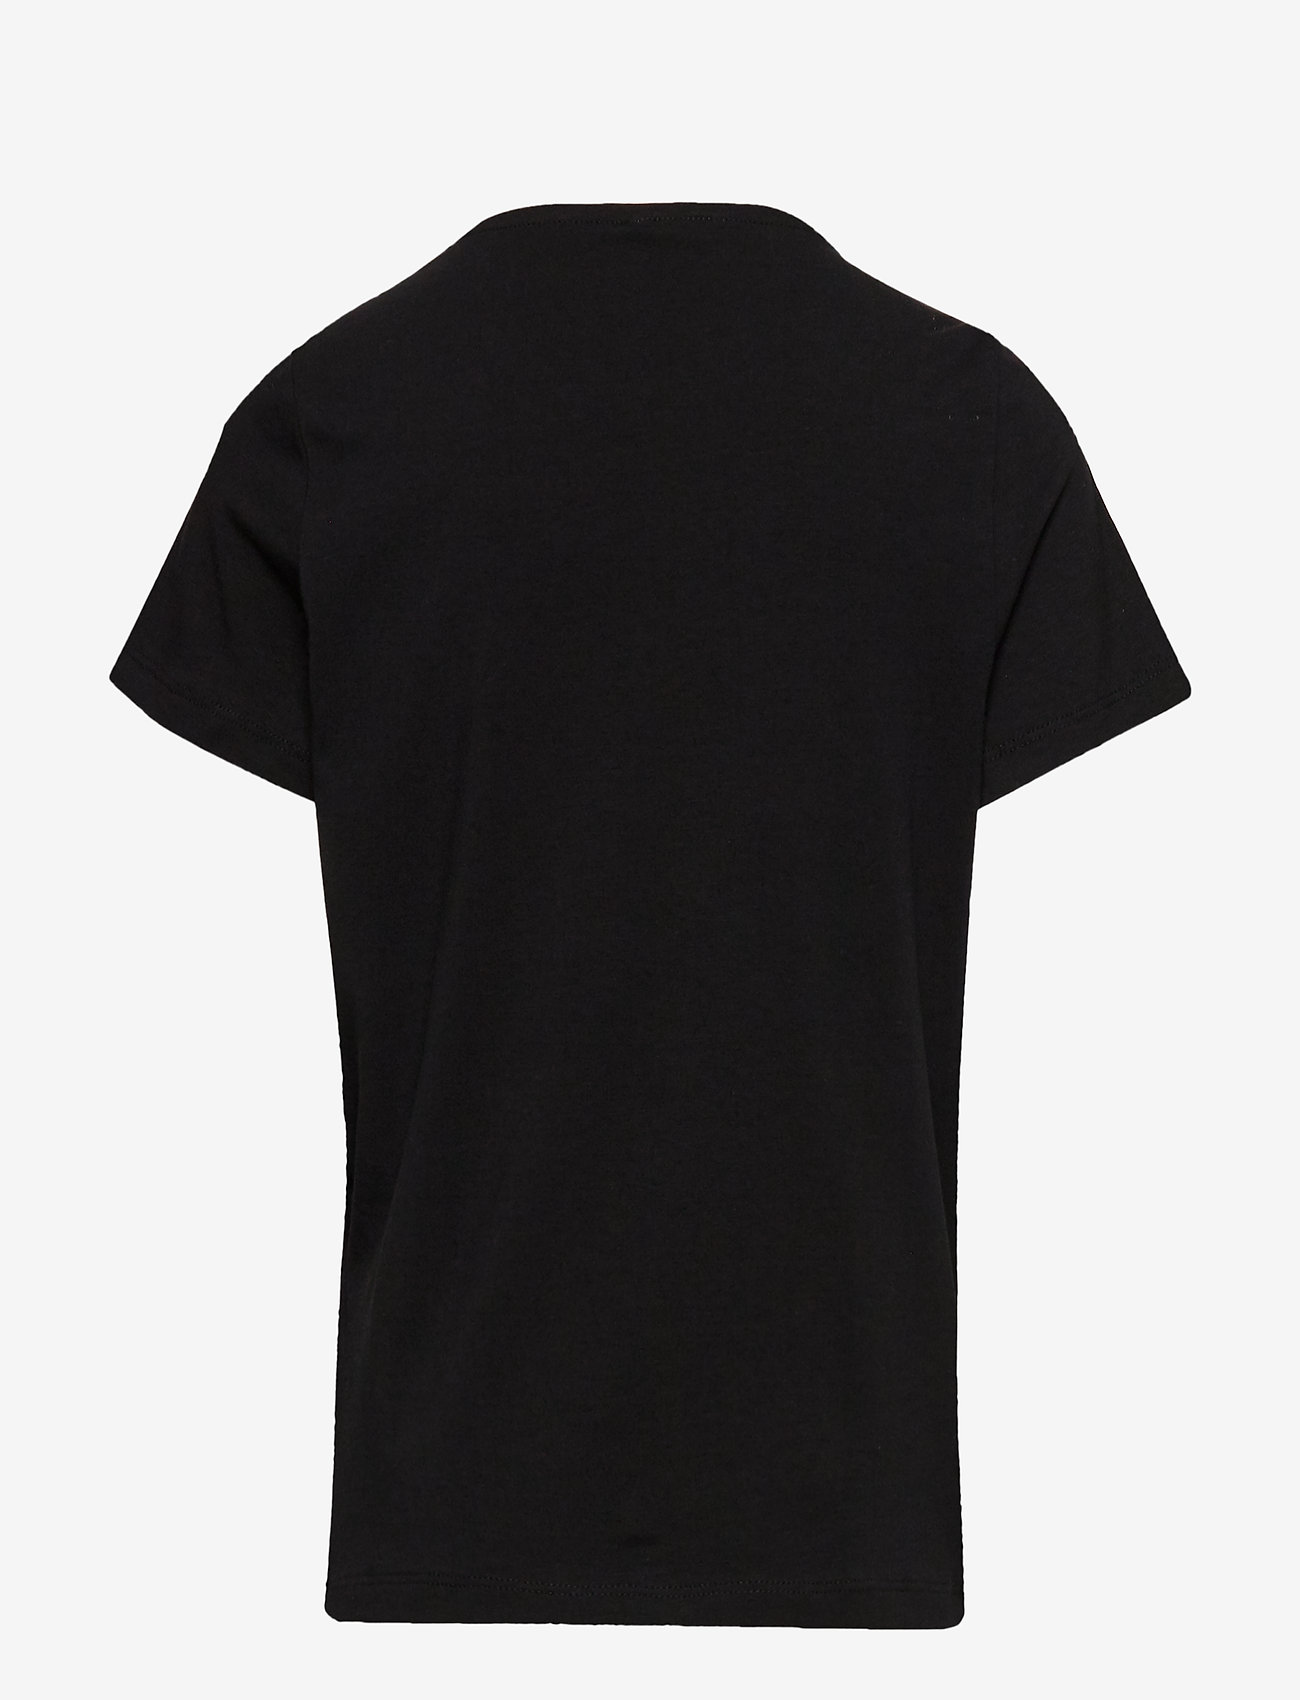 Kids Only - KONLOVE LIFE S/S TOP NOOS - t-shirts - black - 1